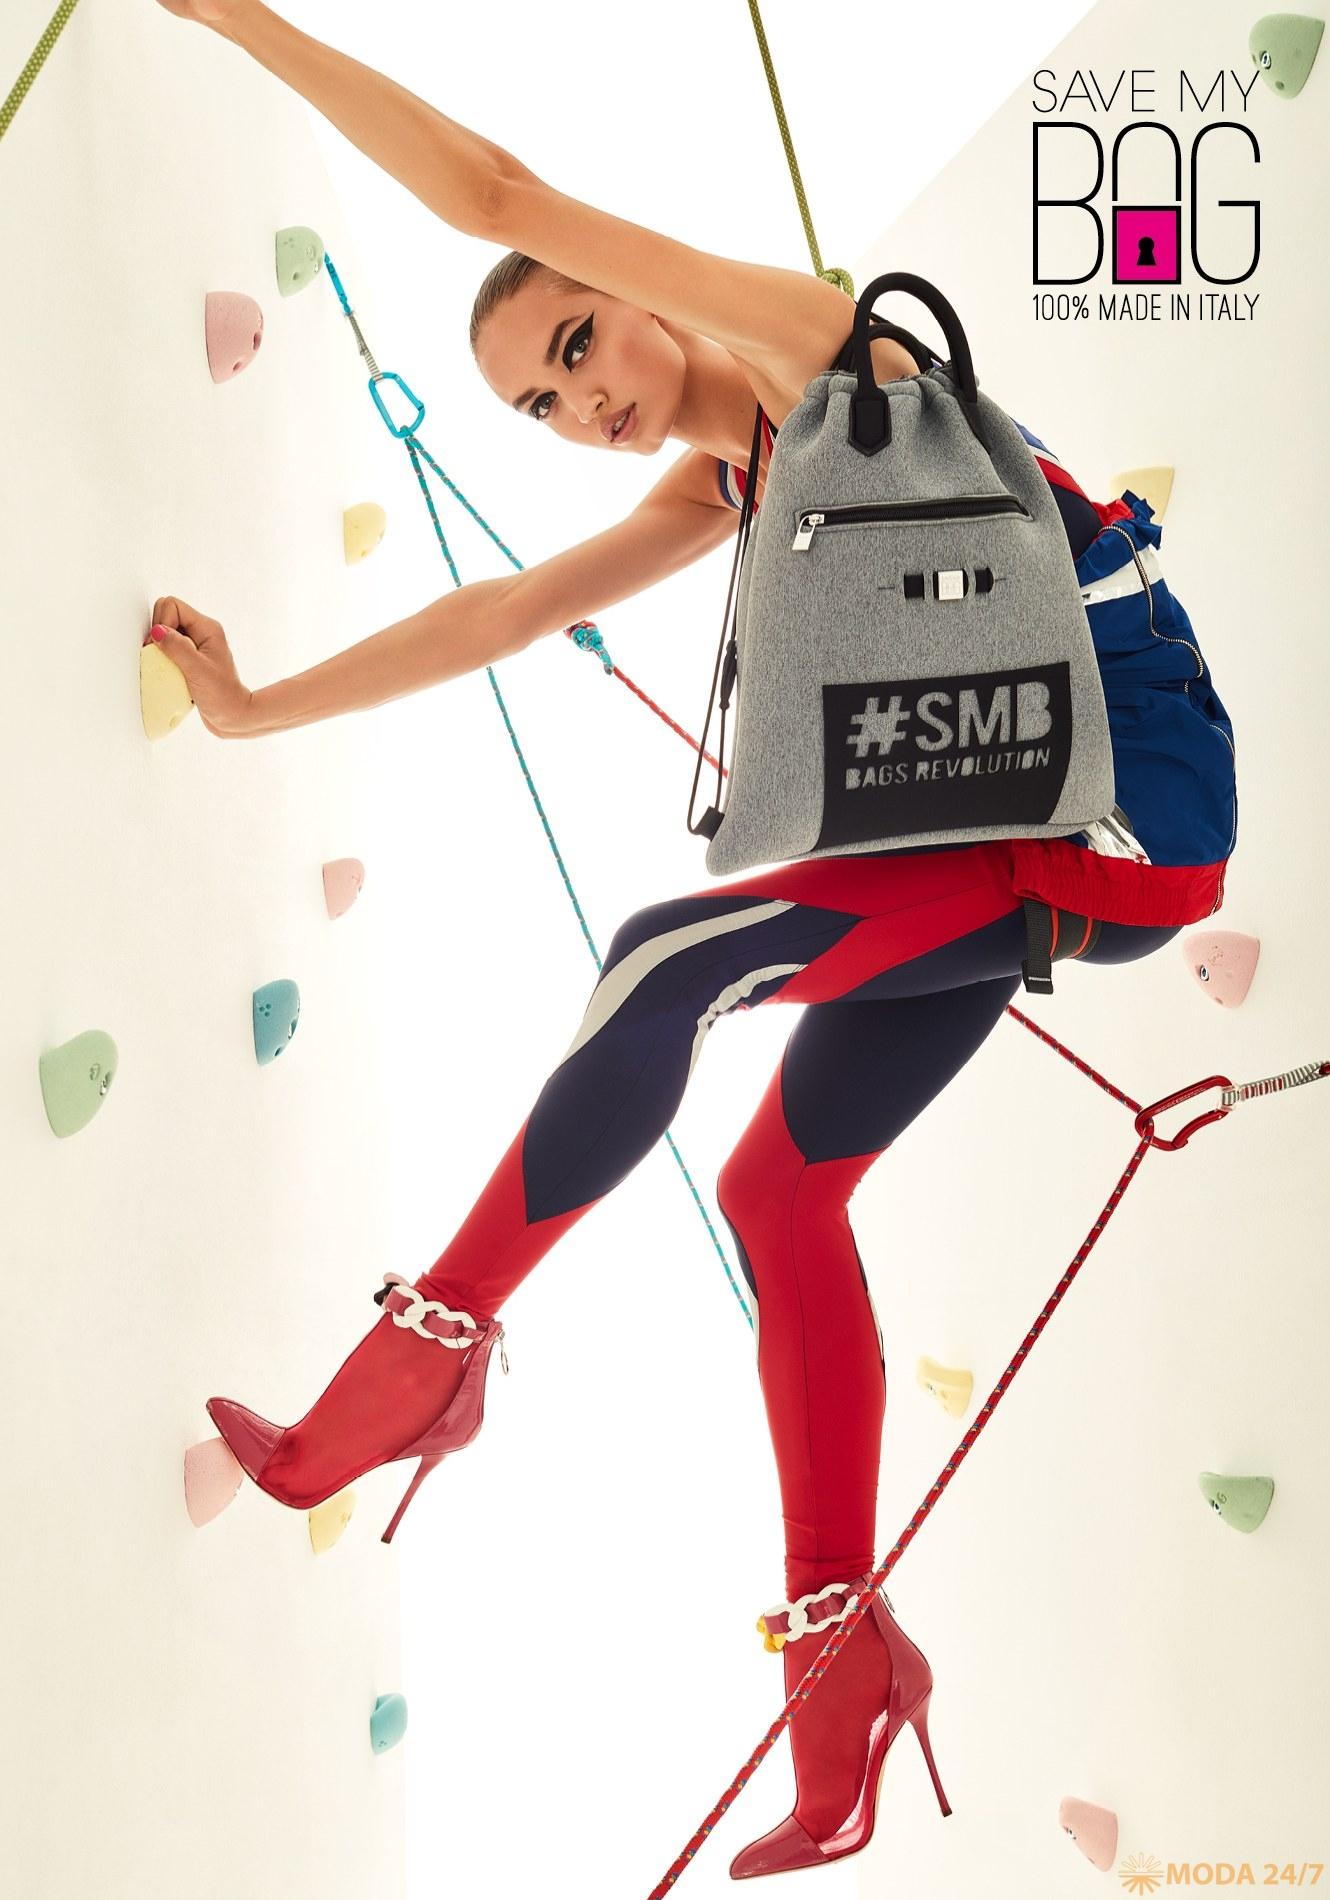 Рюкзак CLOUD ACTIVE Save My Bag. Save My Bag AW-2018/19 (осень-зима 2018/19)